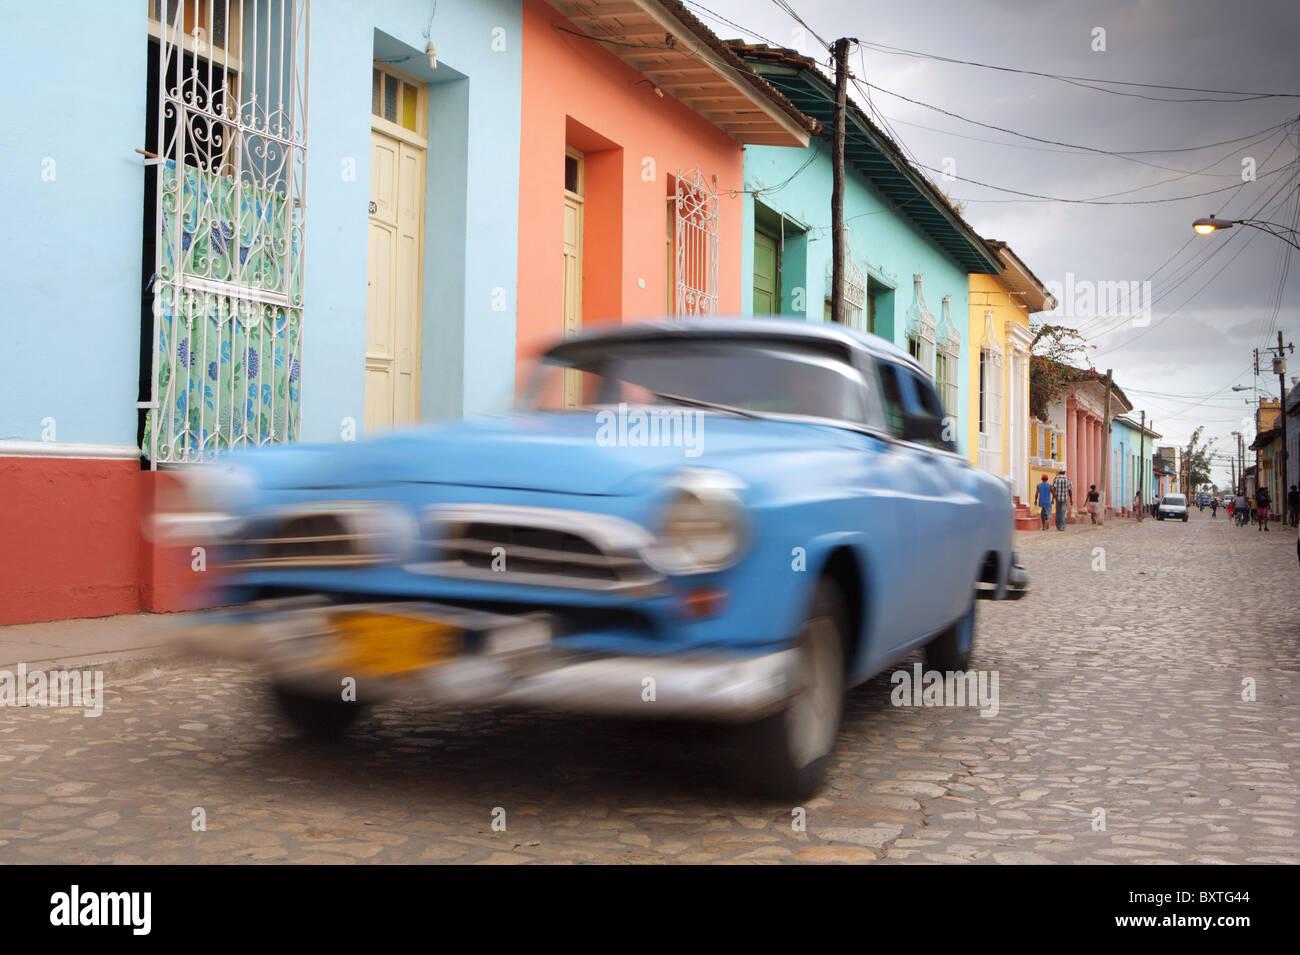 TRINIDAD: OLDTIMER AUF BUNTE COLONIAL STRAßE Stockfoto